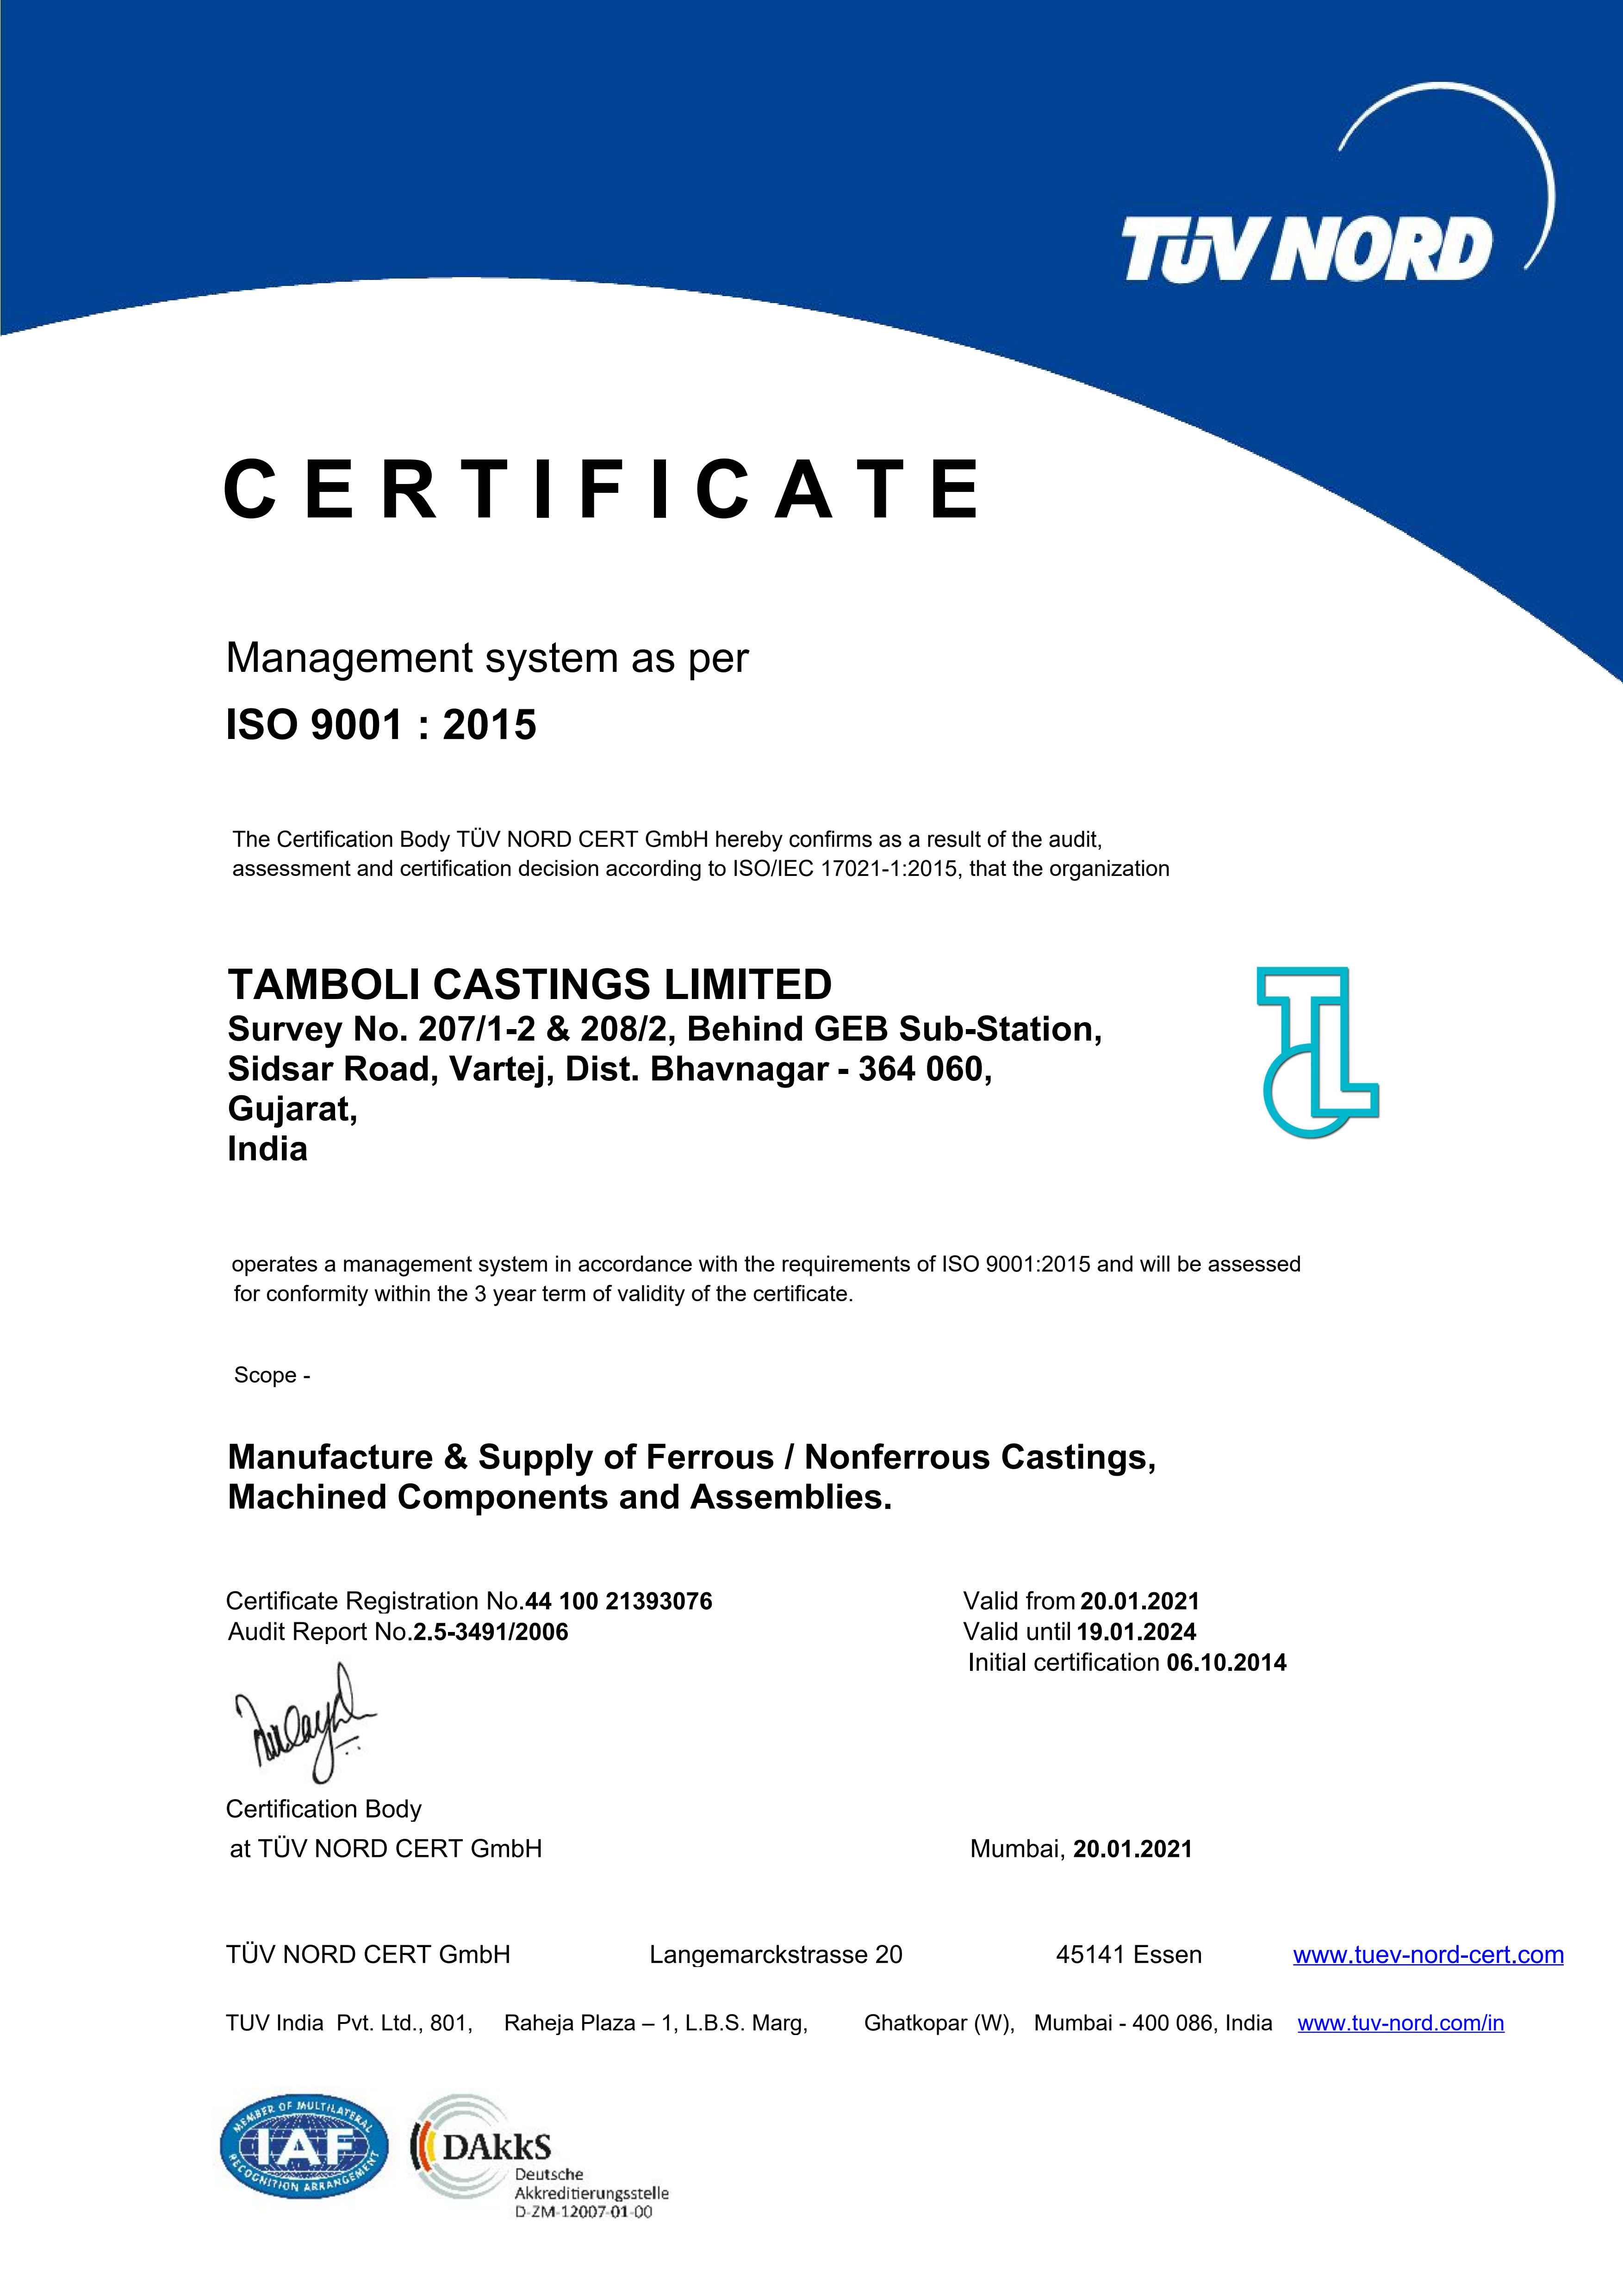 Tamboli Castings Limited